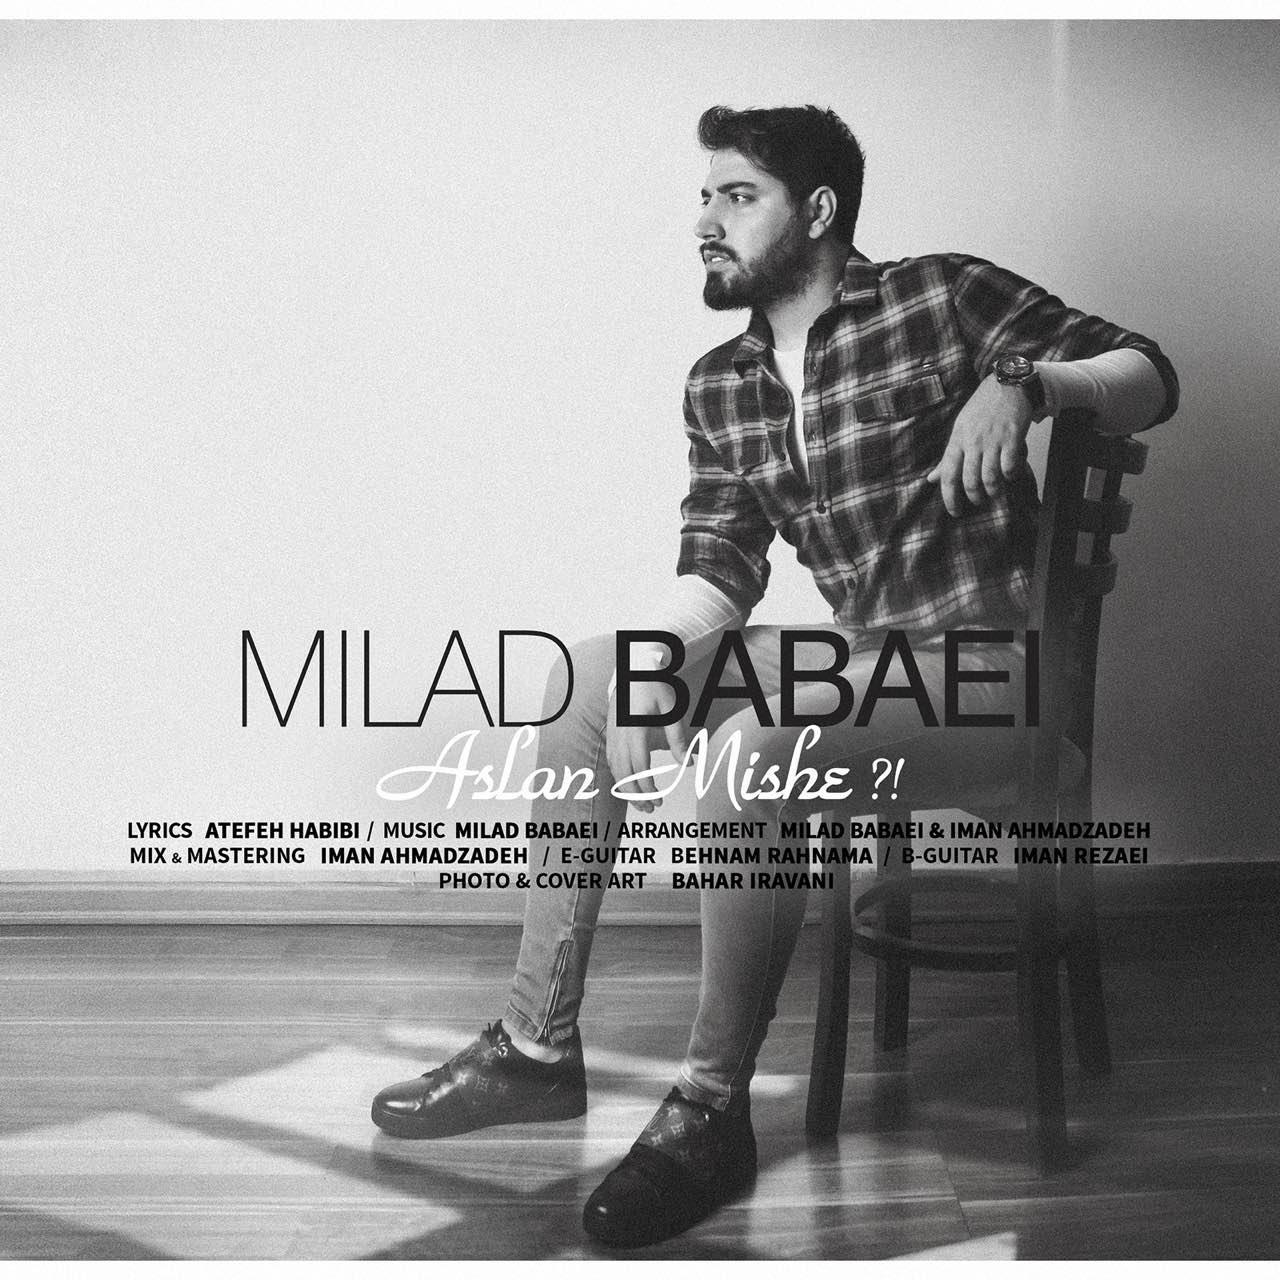 Milad Babaei - Aslan Mishe